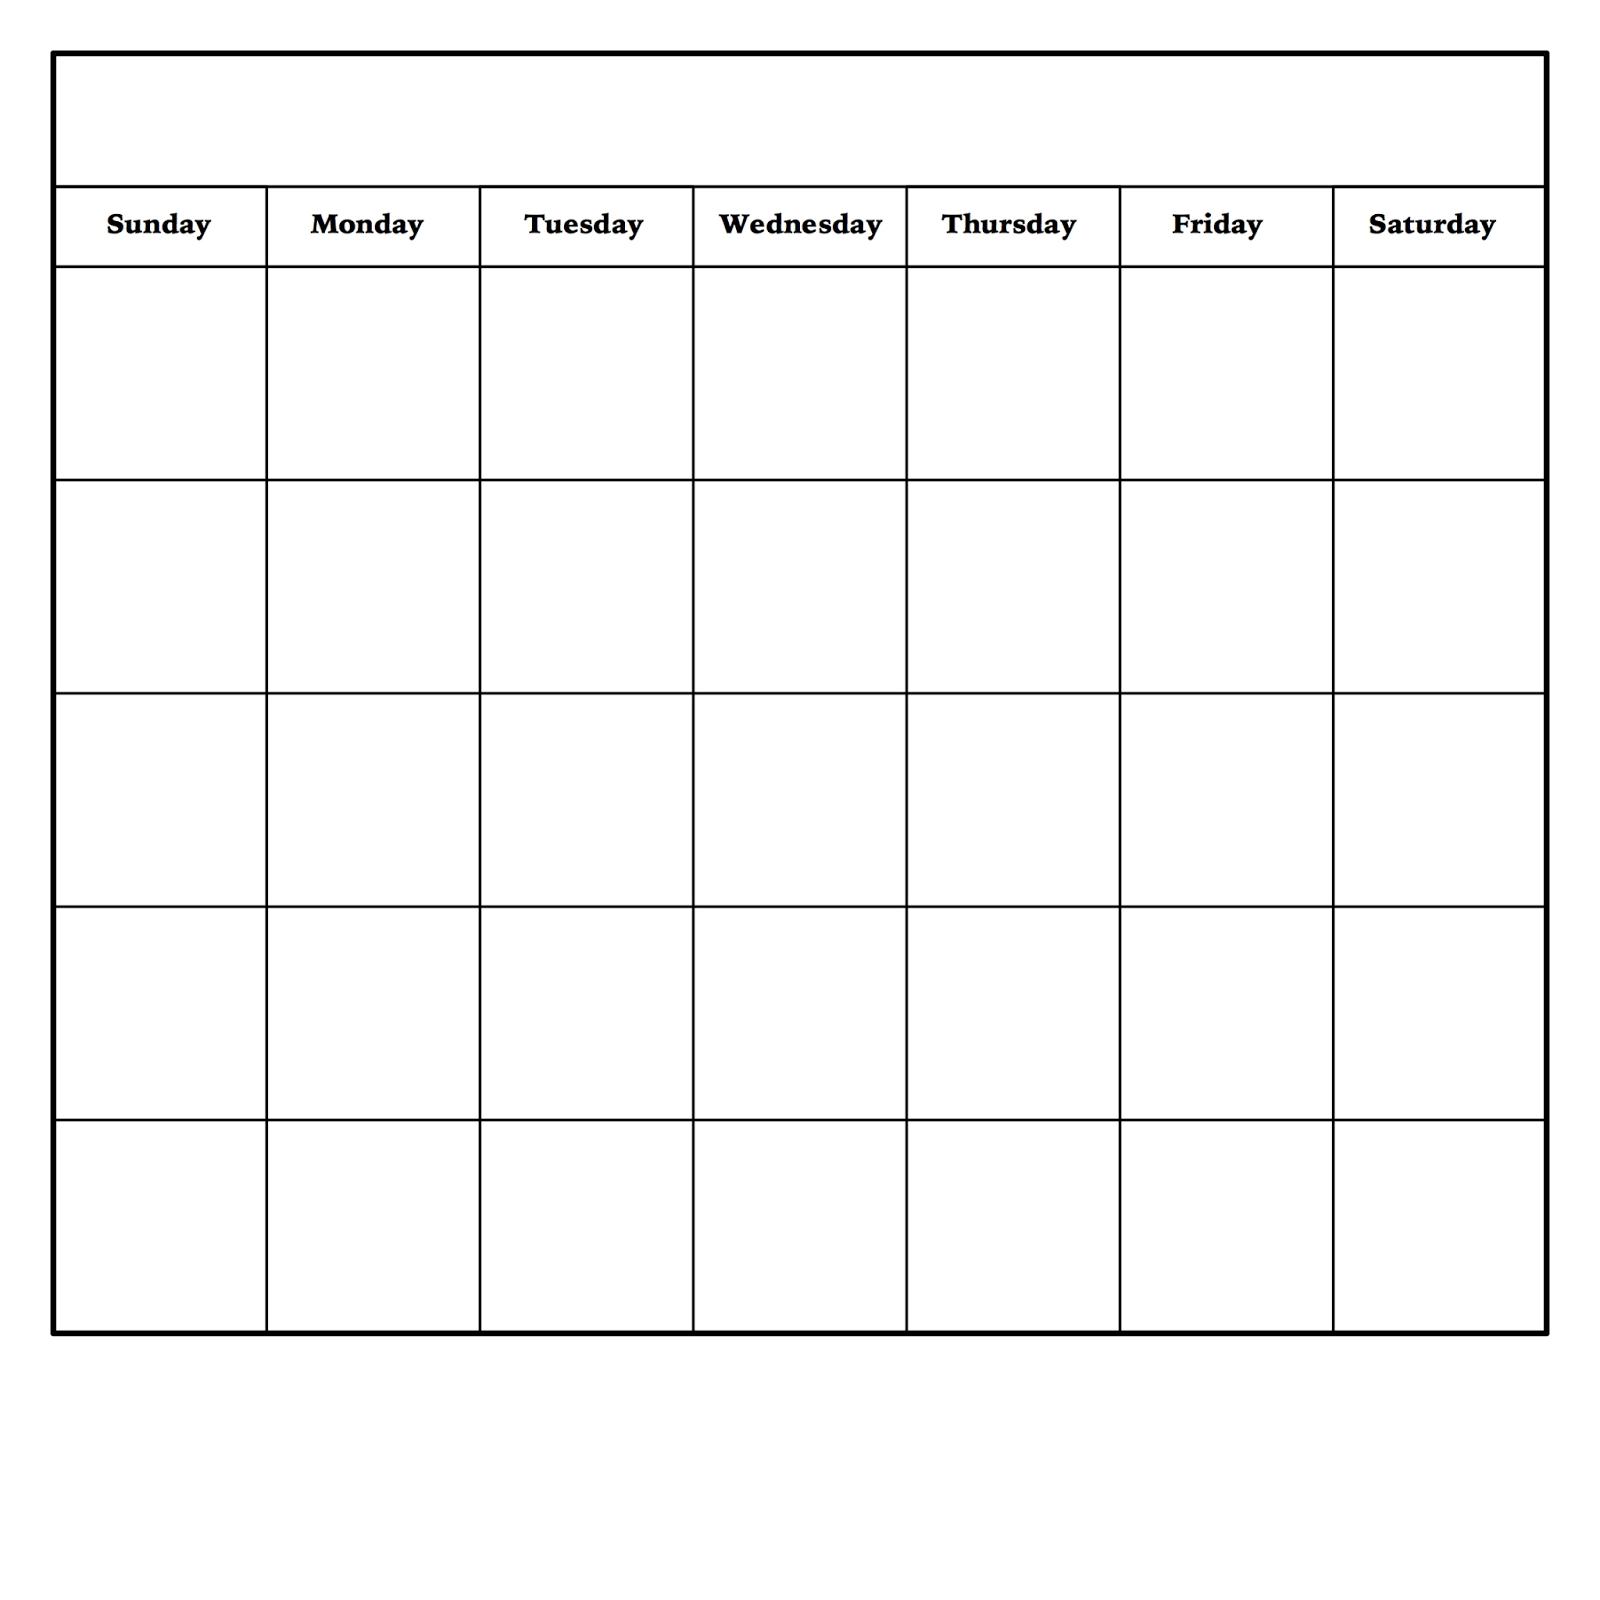 Diy Dry Erase Calendar | Blank Monthly Calendar Template-Blank Calendar Template No Dates